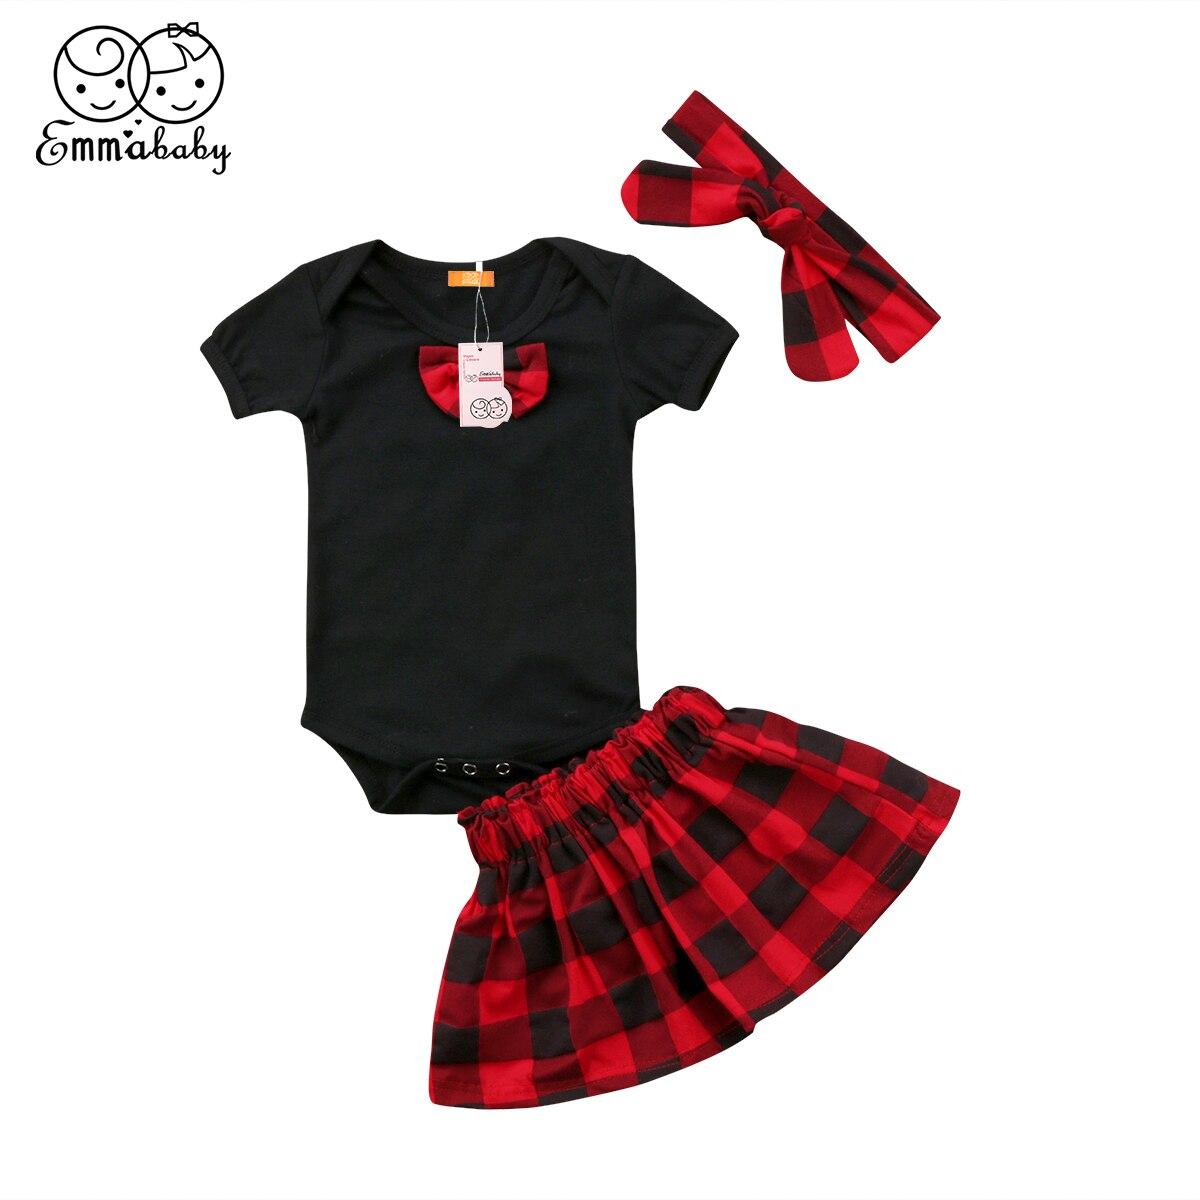 2018 new casual kid plaid sets 3pcs Newborn Infant Kid Baby Girl Clothes Cotton bodysuit plaid SKirt bowknot fashion Outfits Set